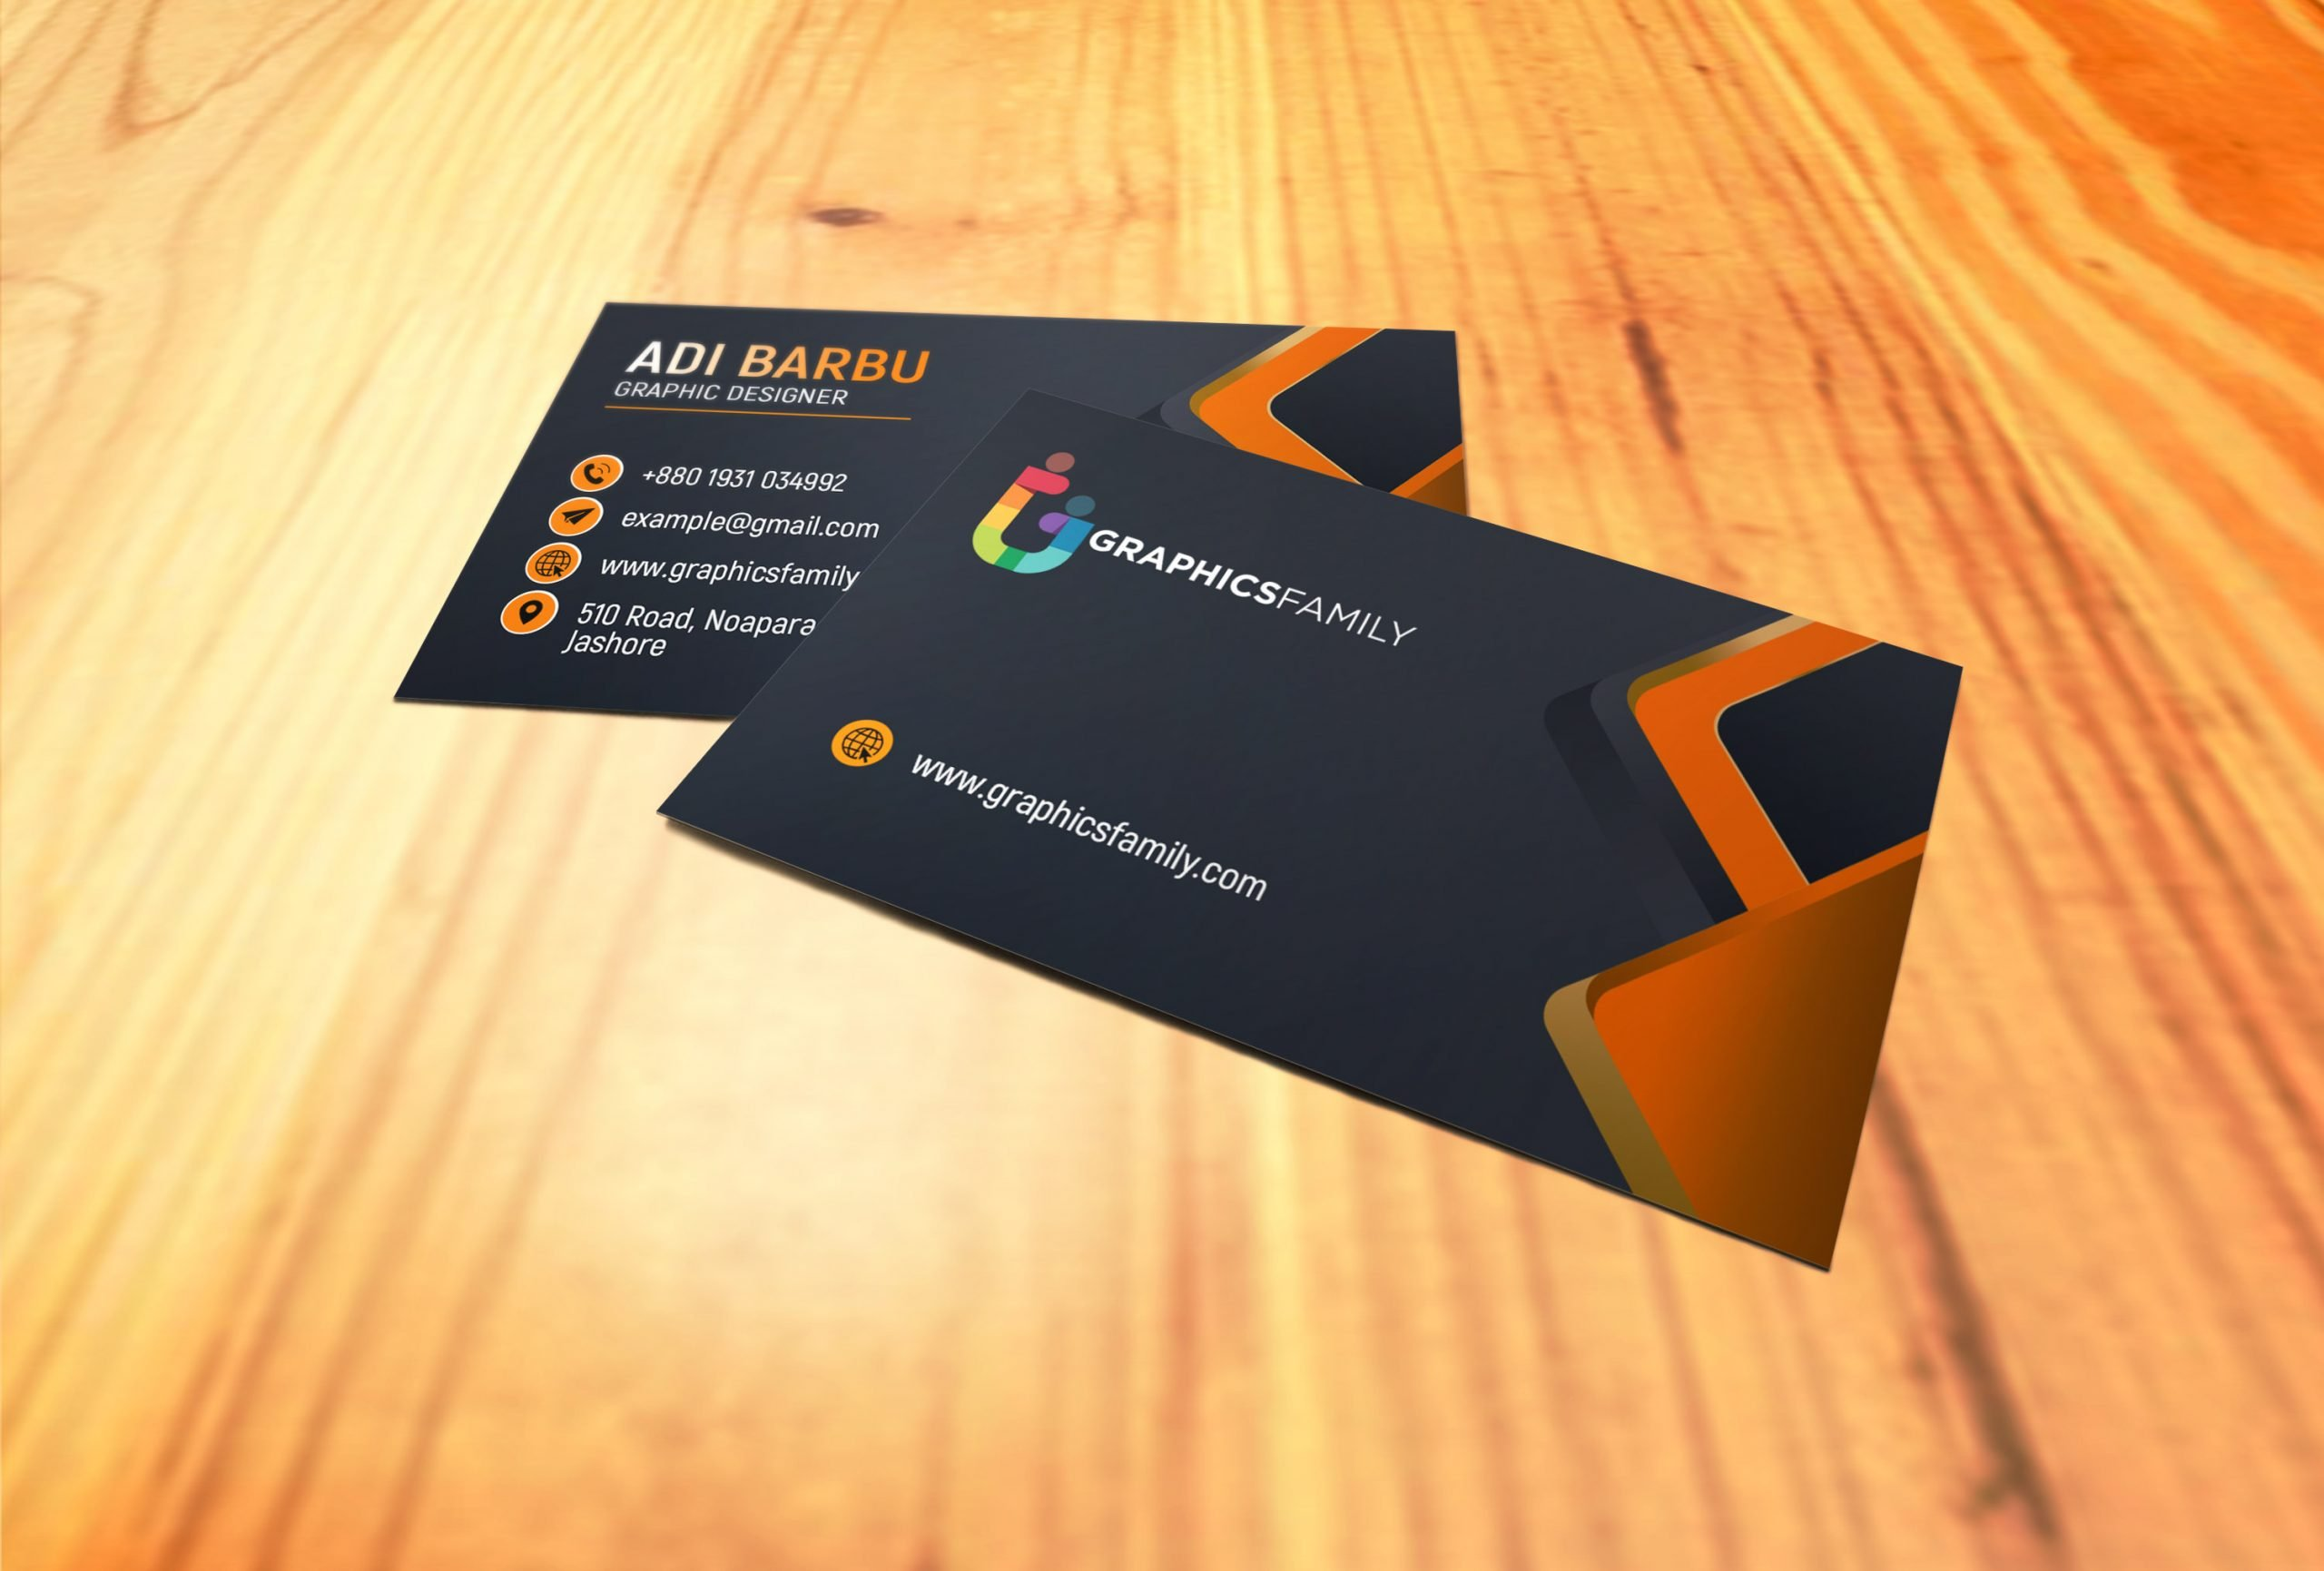 Visiting Card Design with Black and Orange Download